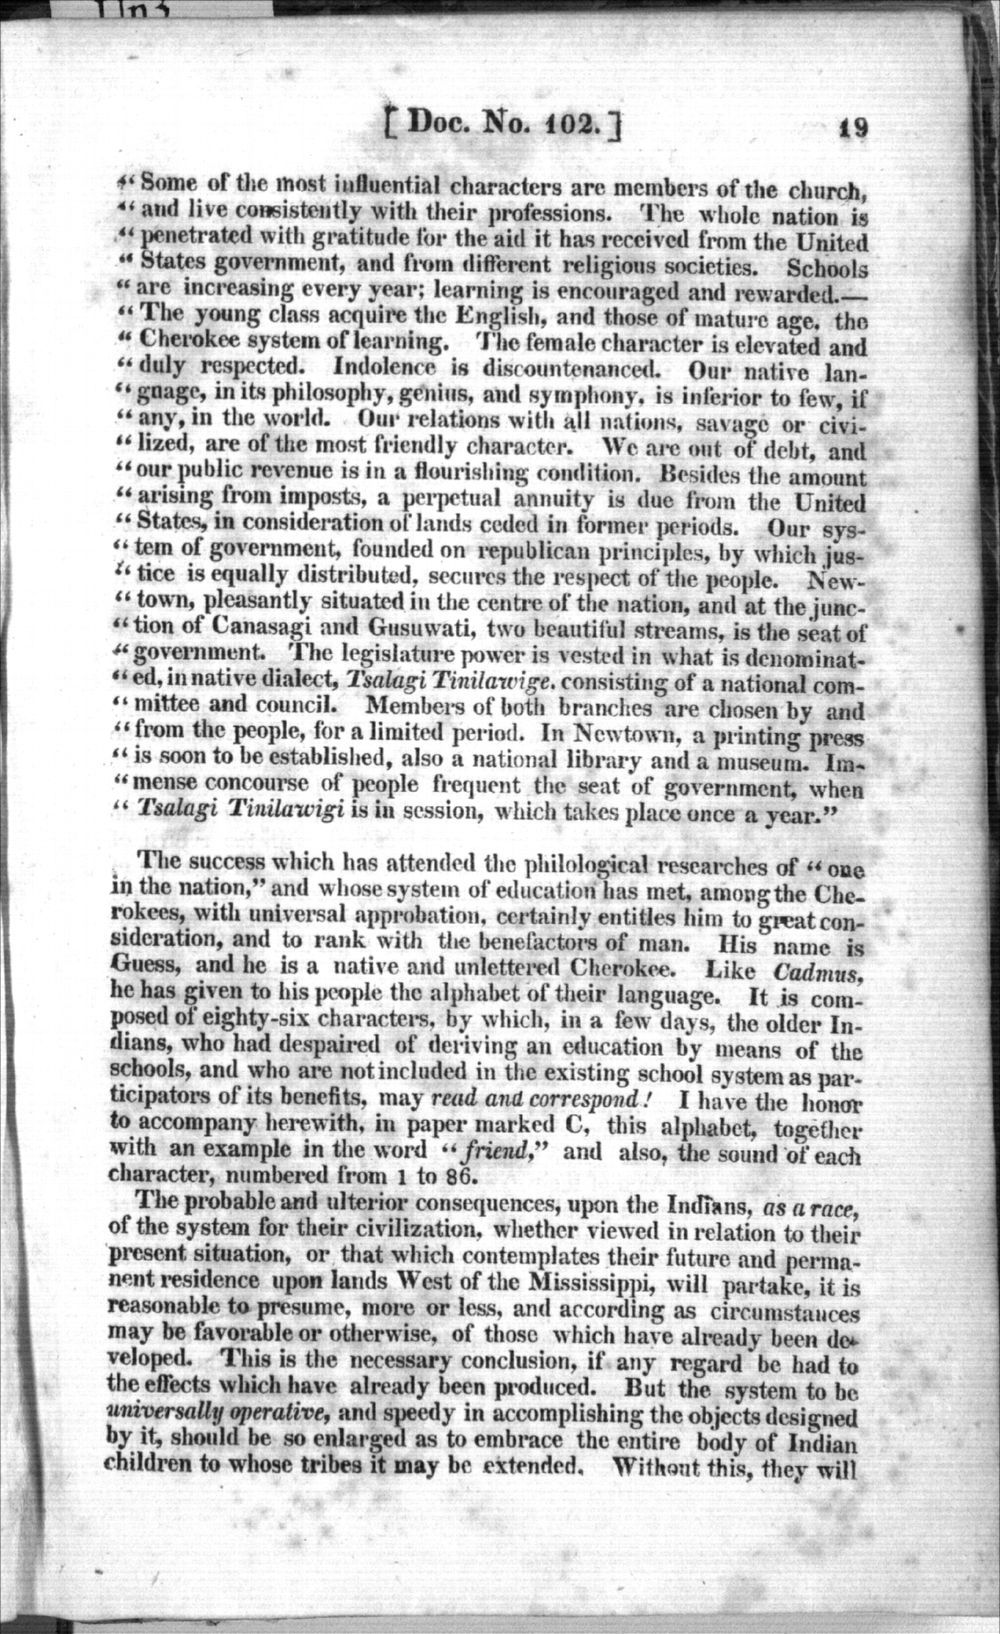 Thomas L. McKenney to James Barbour - 5